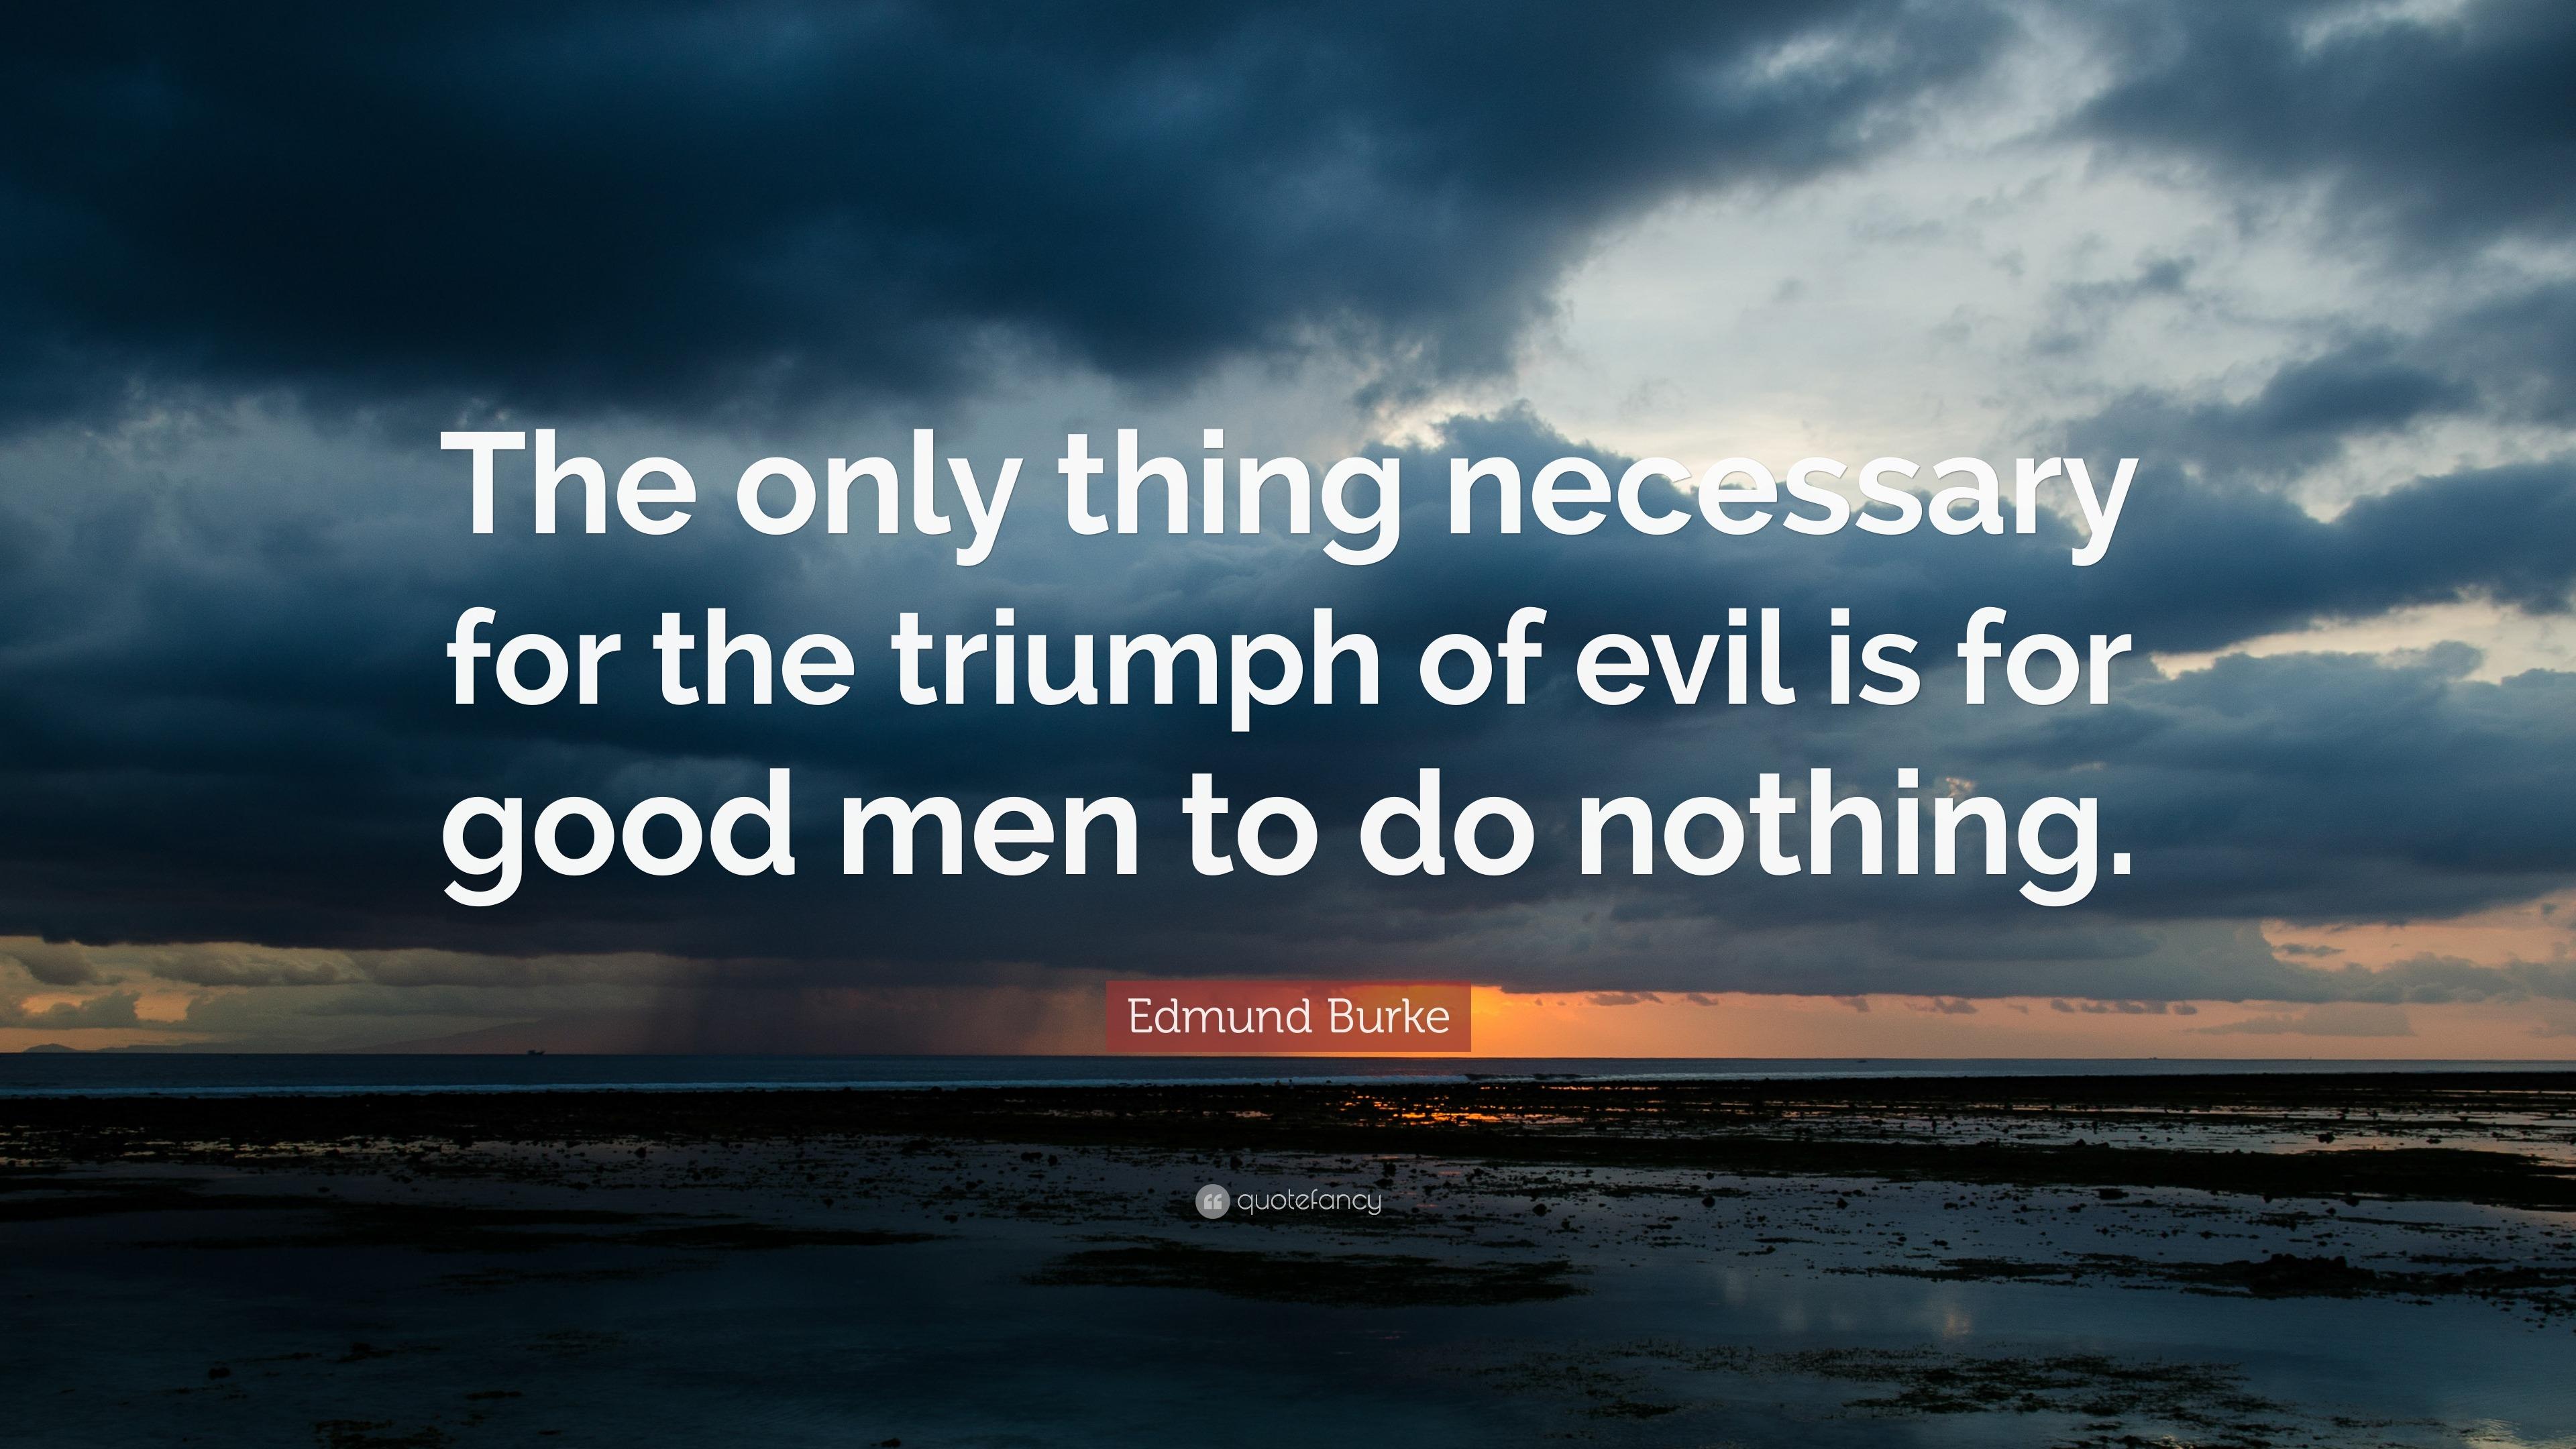 Burke Evil Triumph Good Men Do Nothing